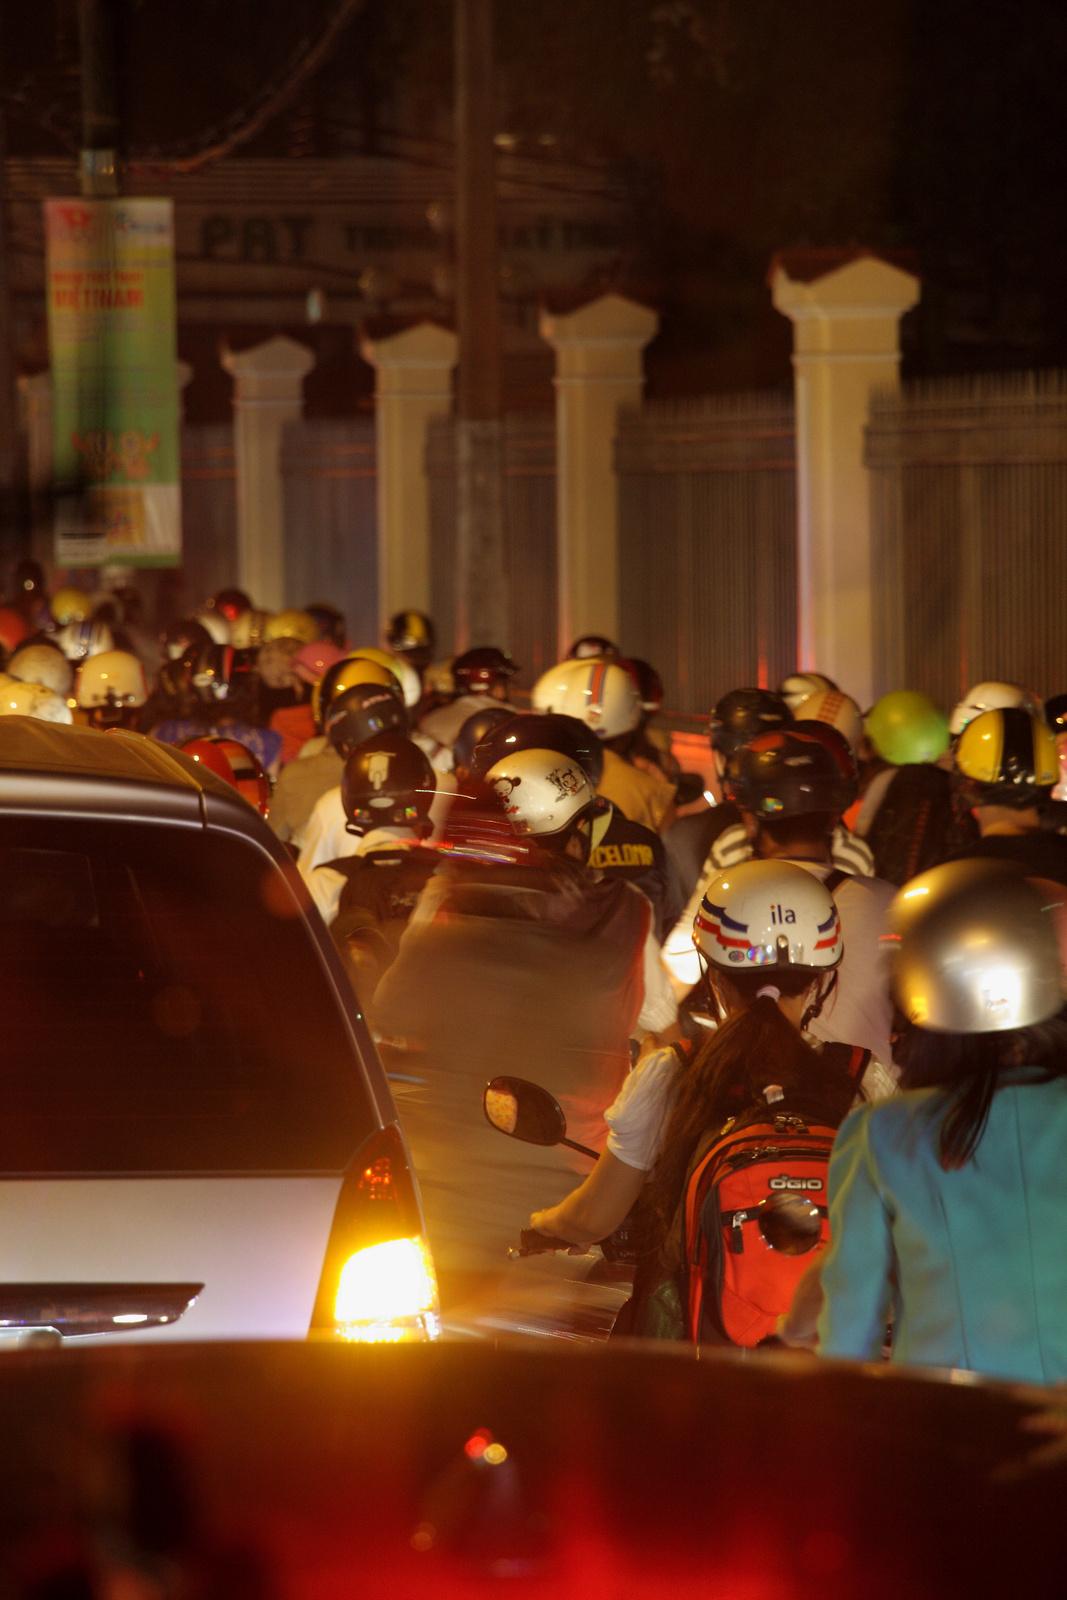 Traffic jam at night again